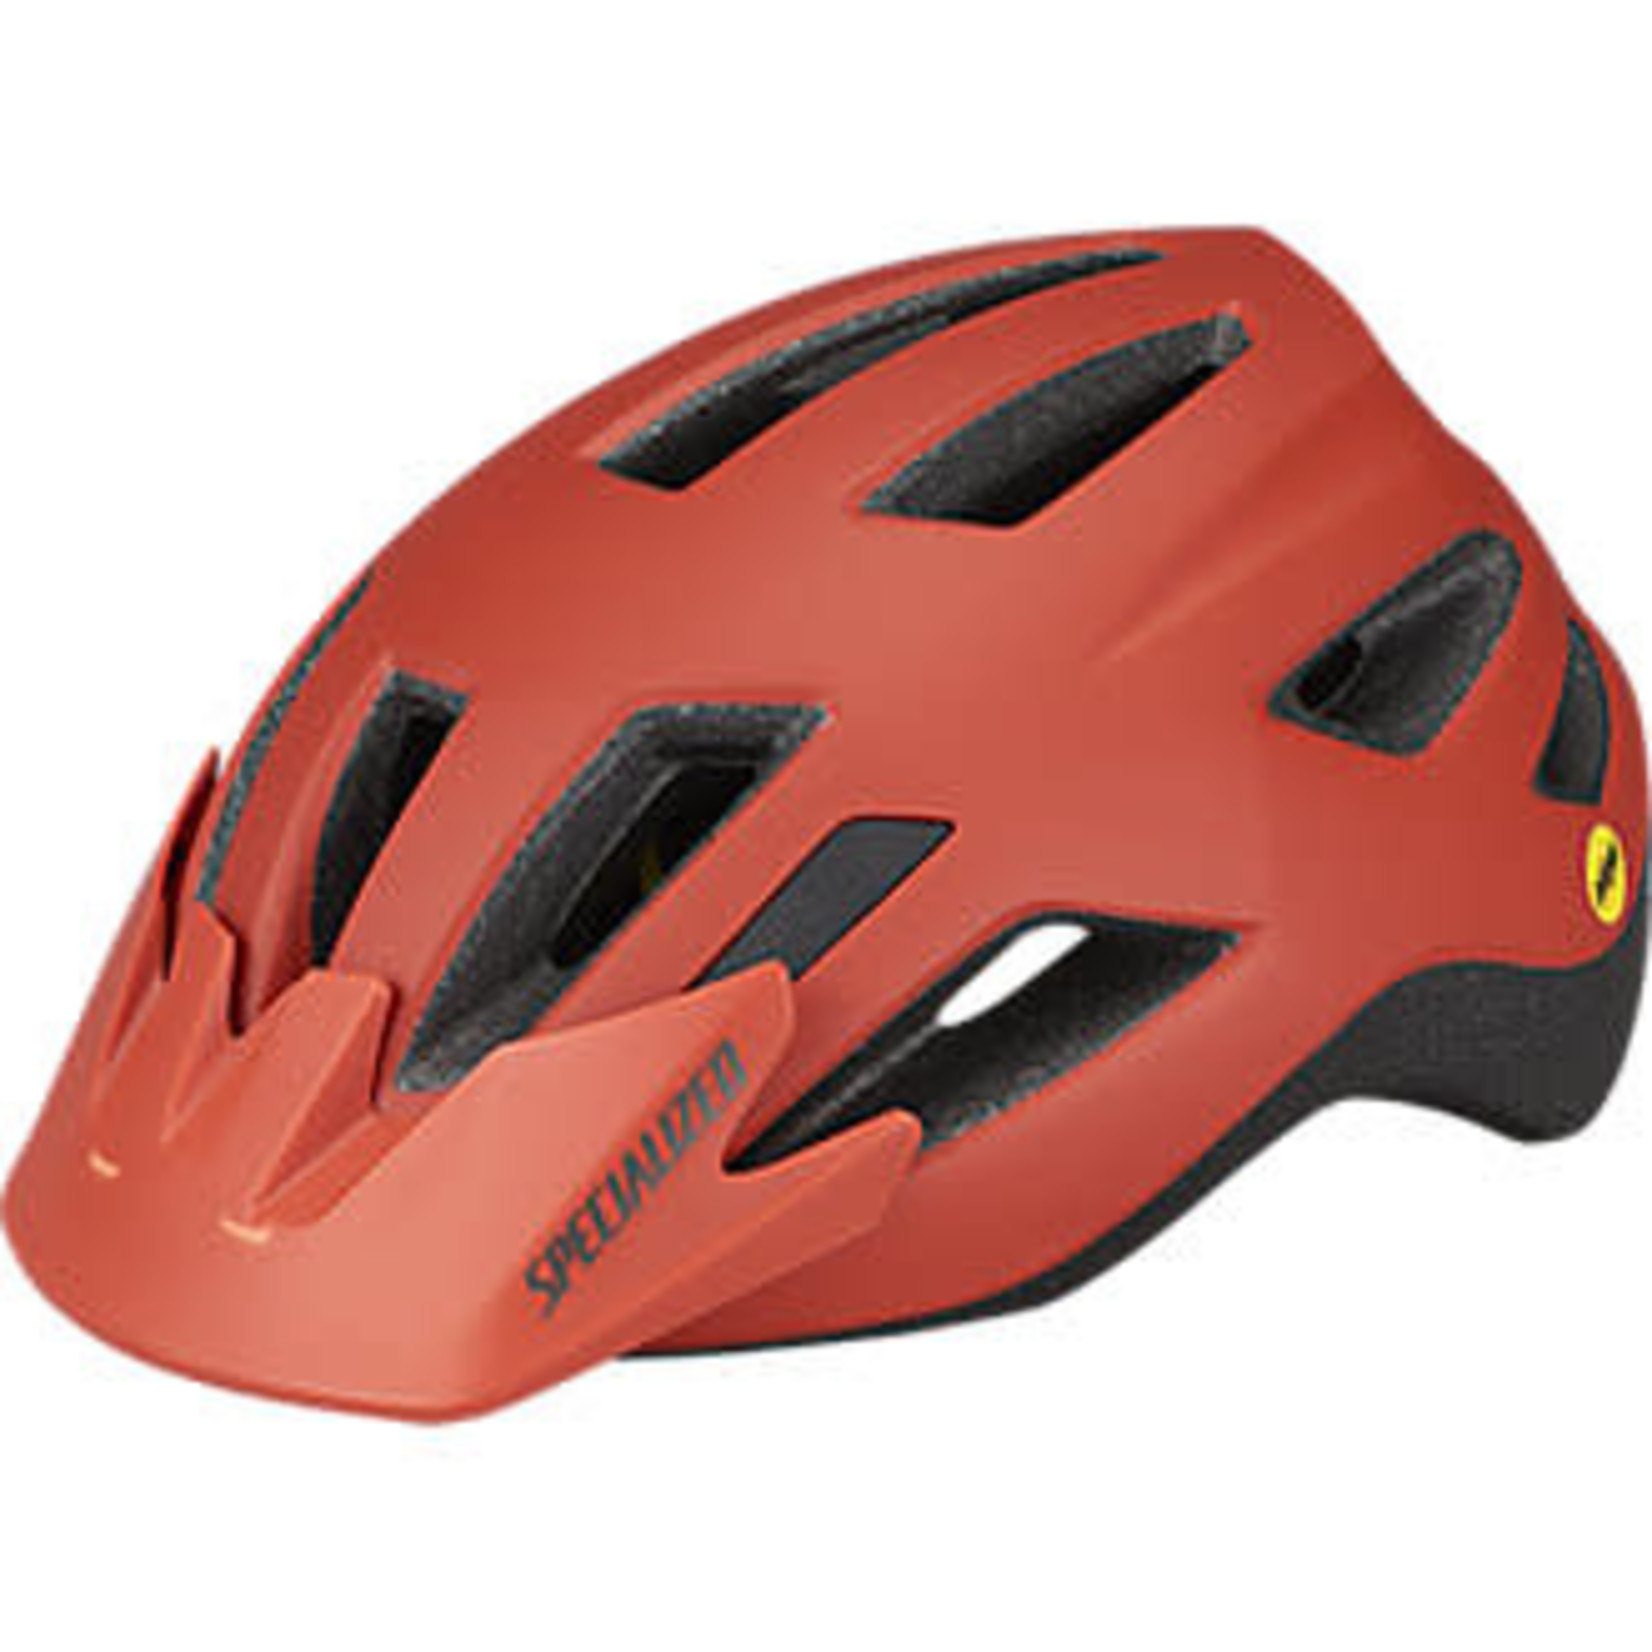 Specialized Specialized Shuffle LED Child Helmet